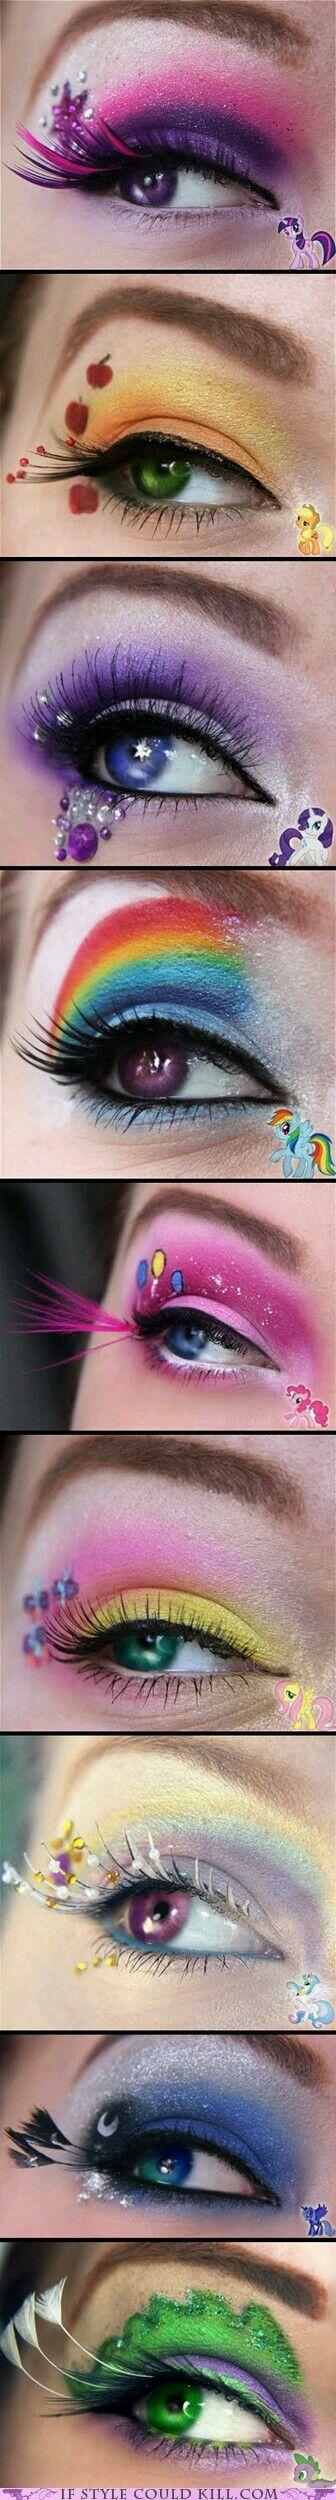 best beautiful eyes images on pinterest